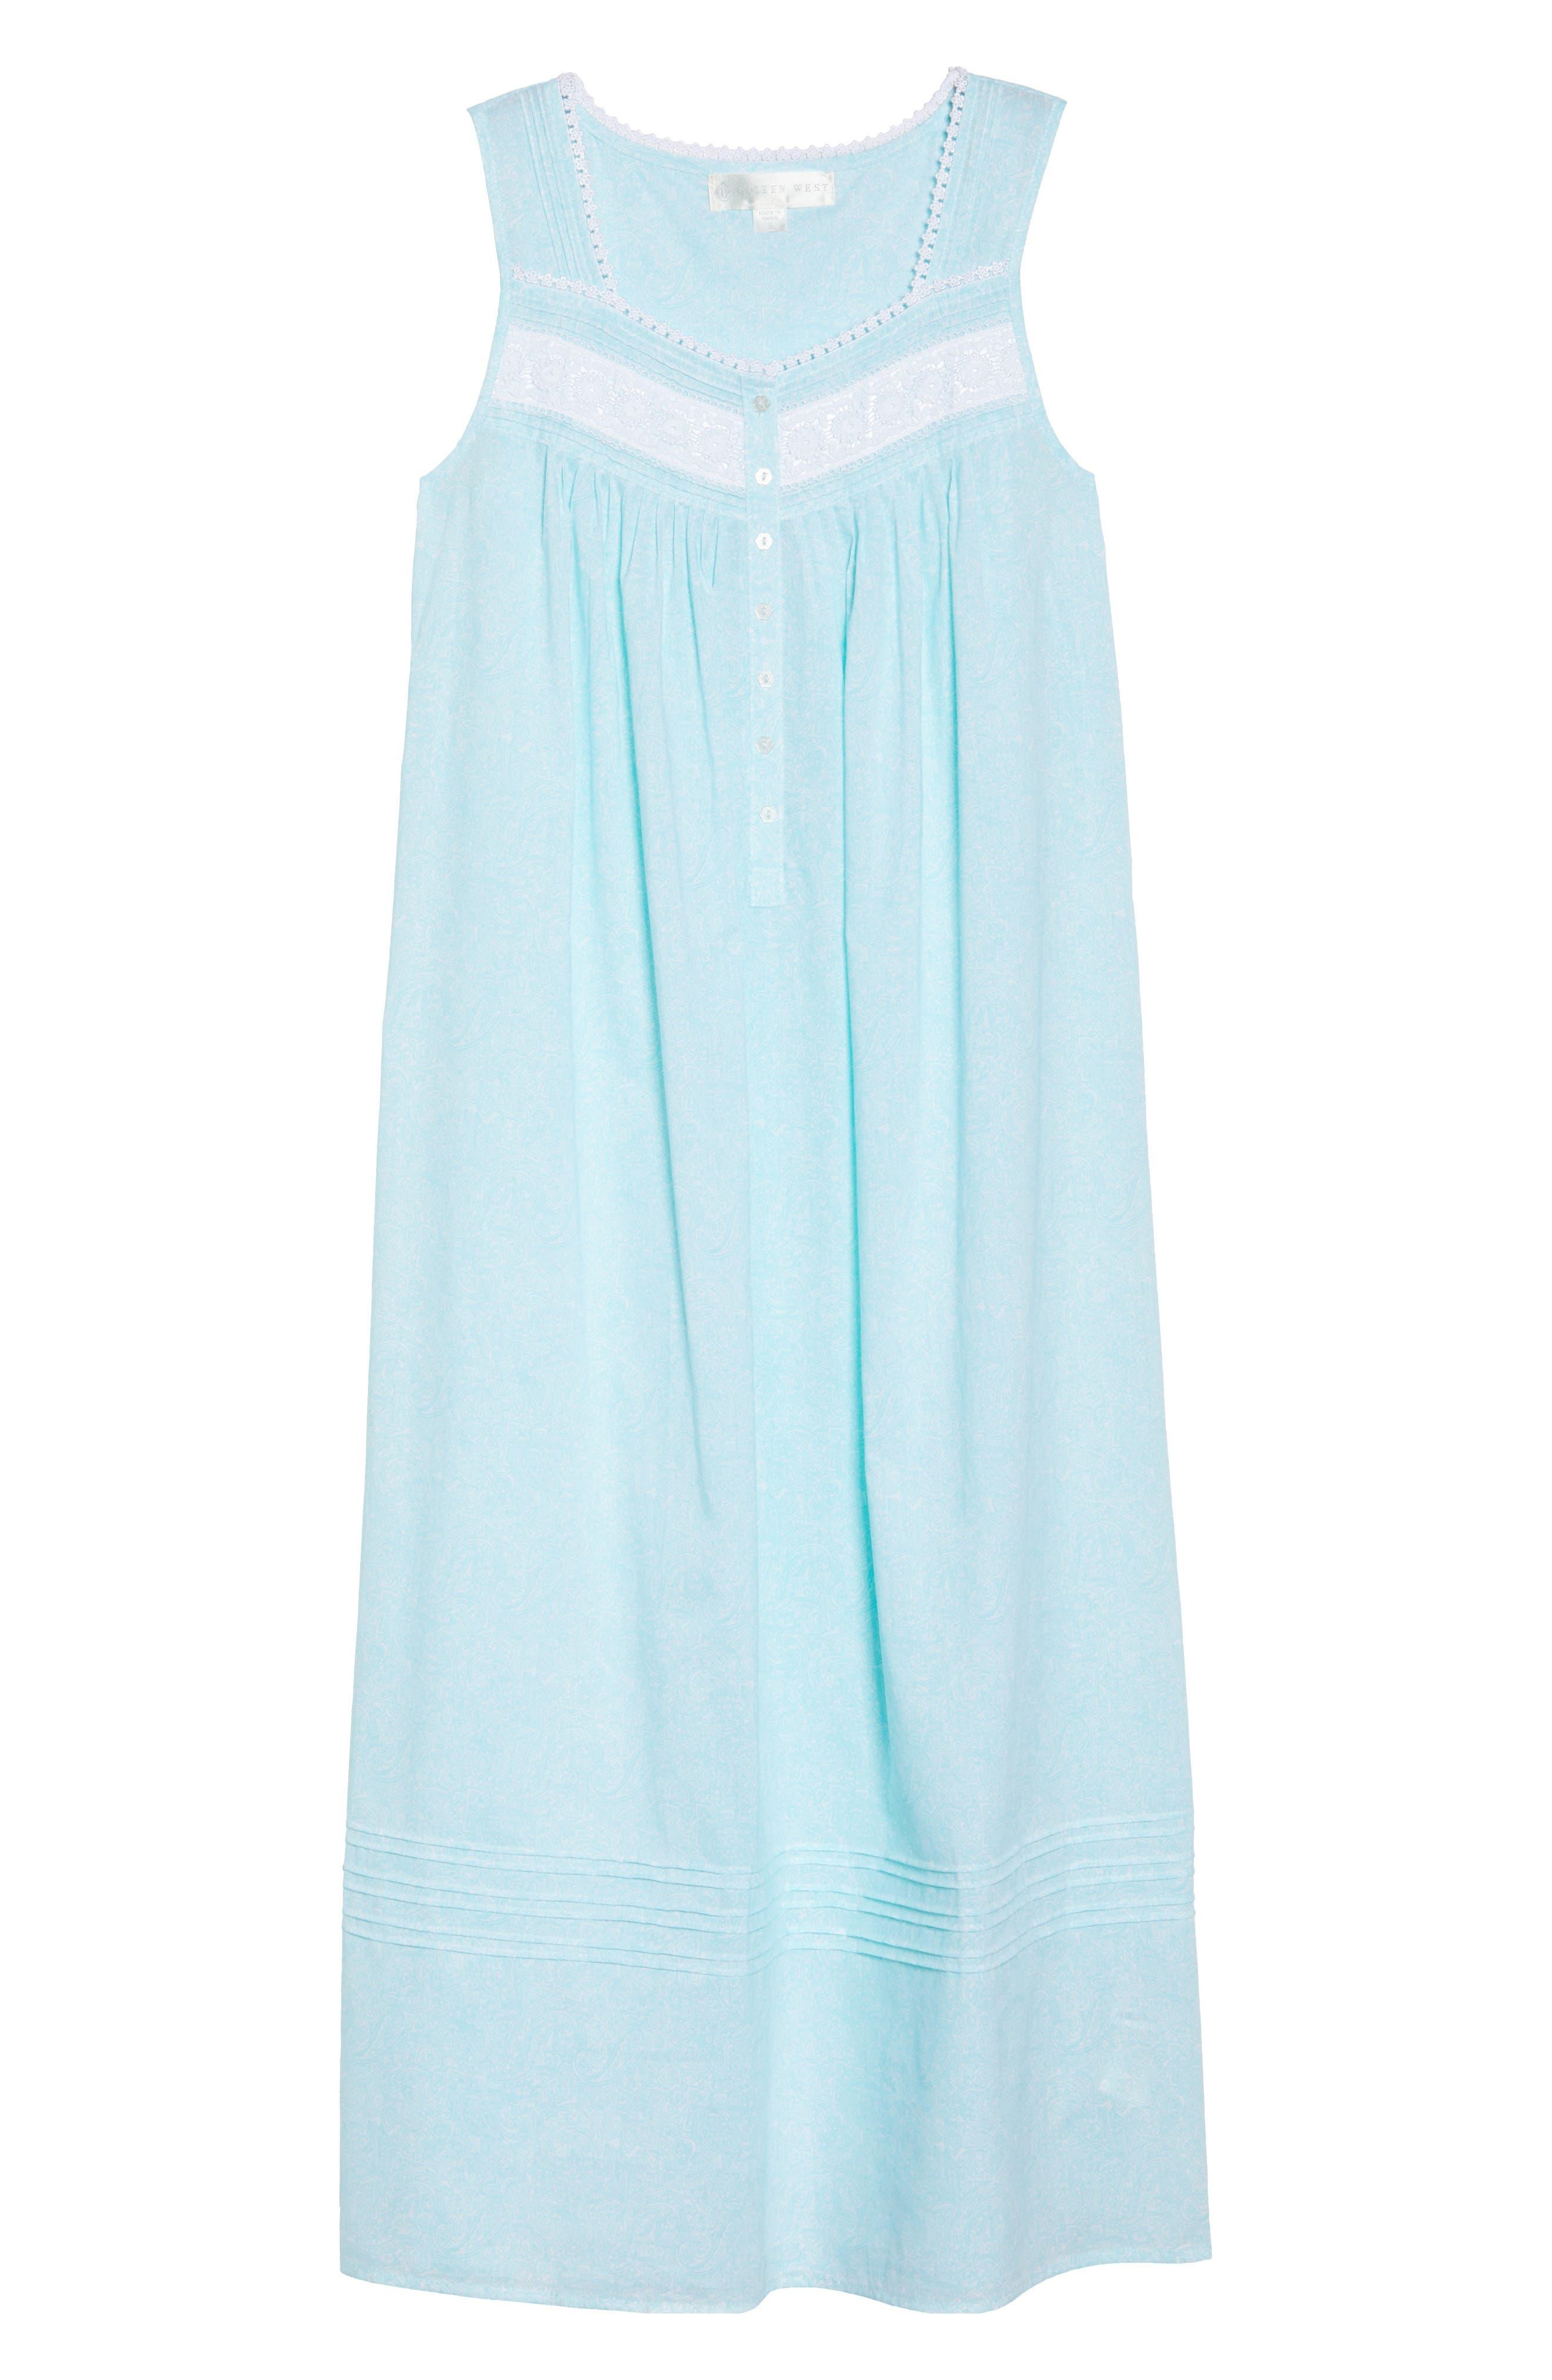 Cotton Lawn Ballet Nightgown,                             Alternate thumbnail 6, color,